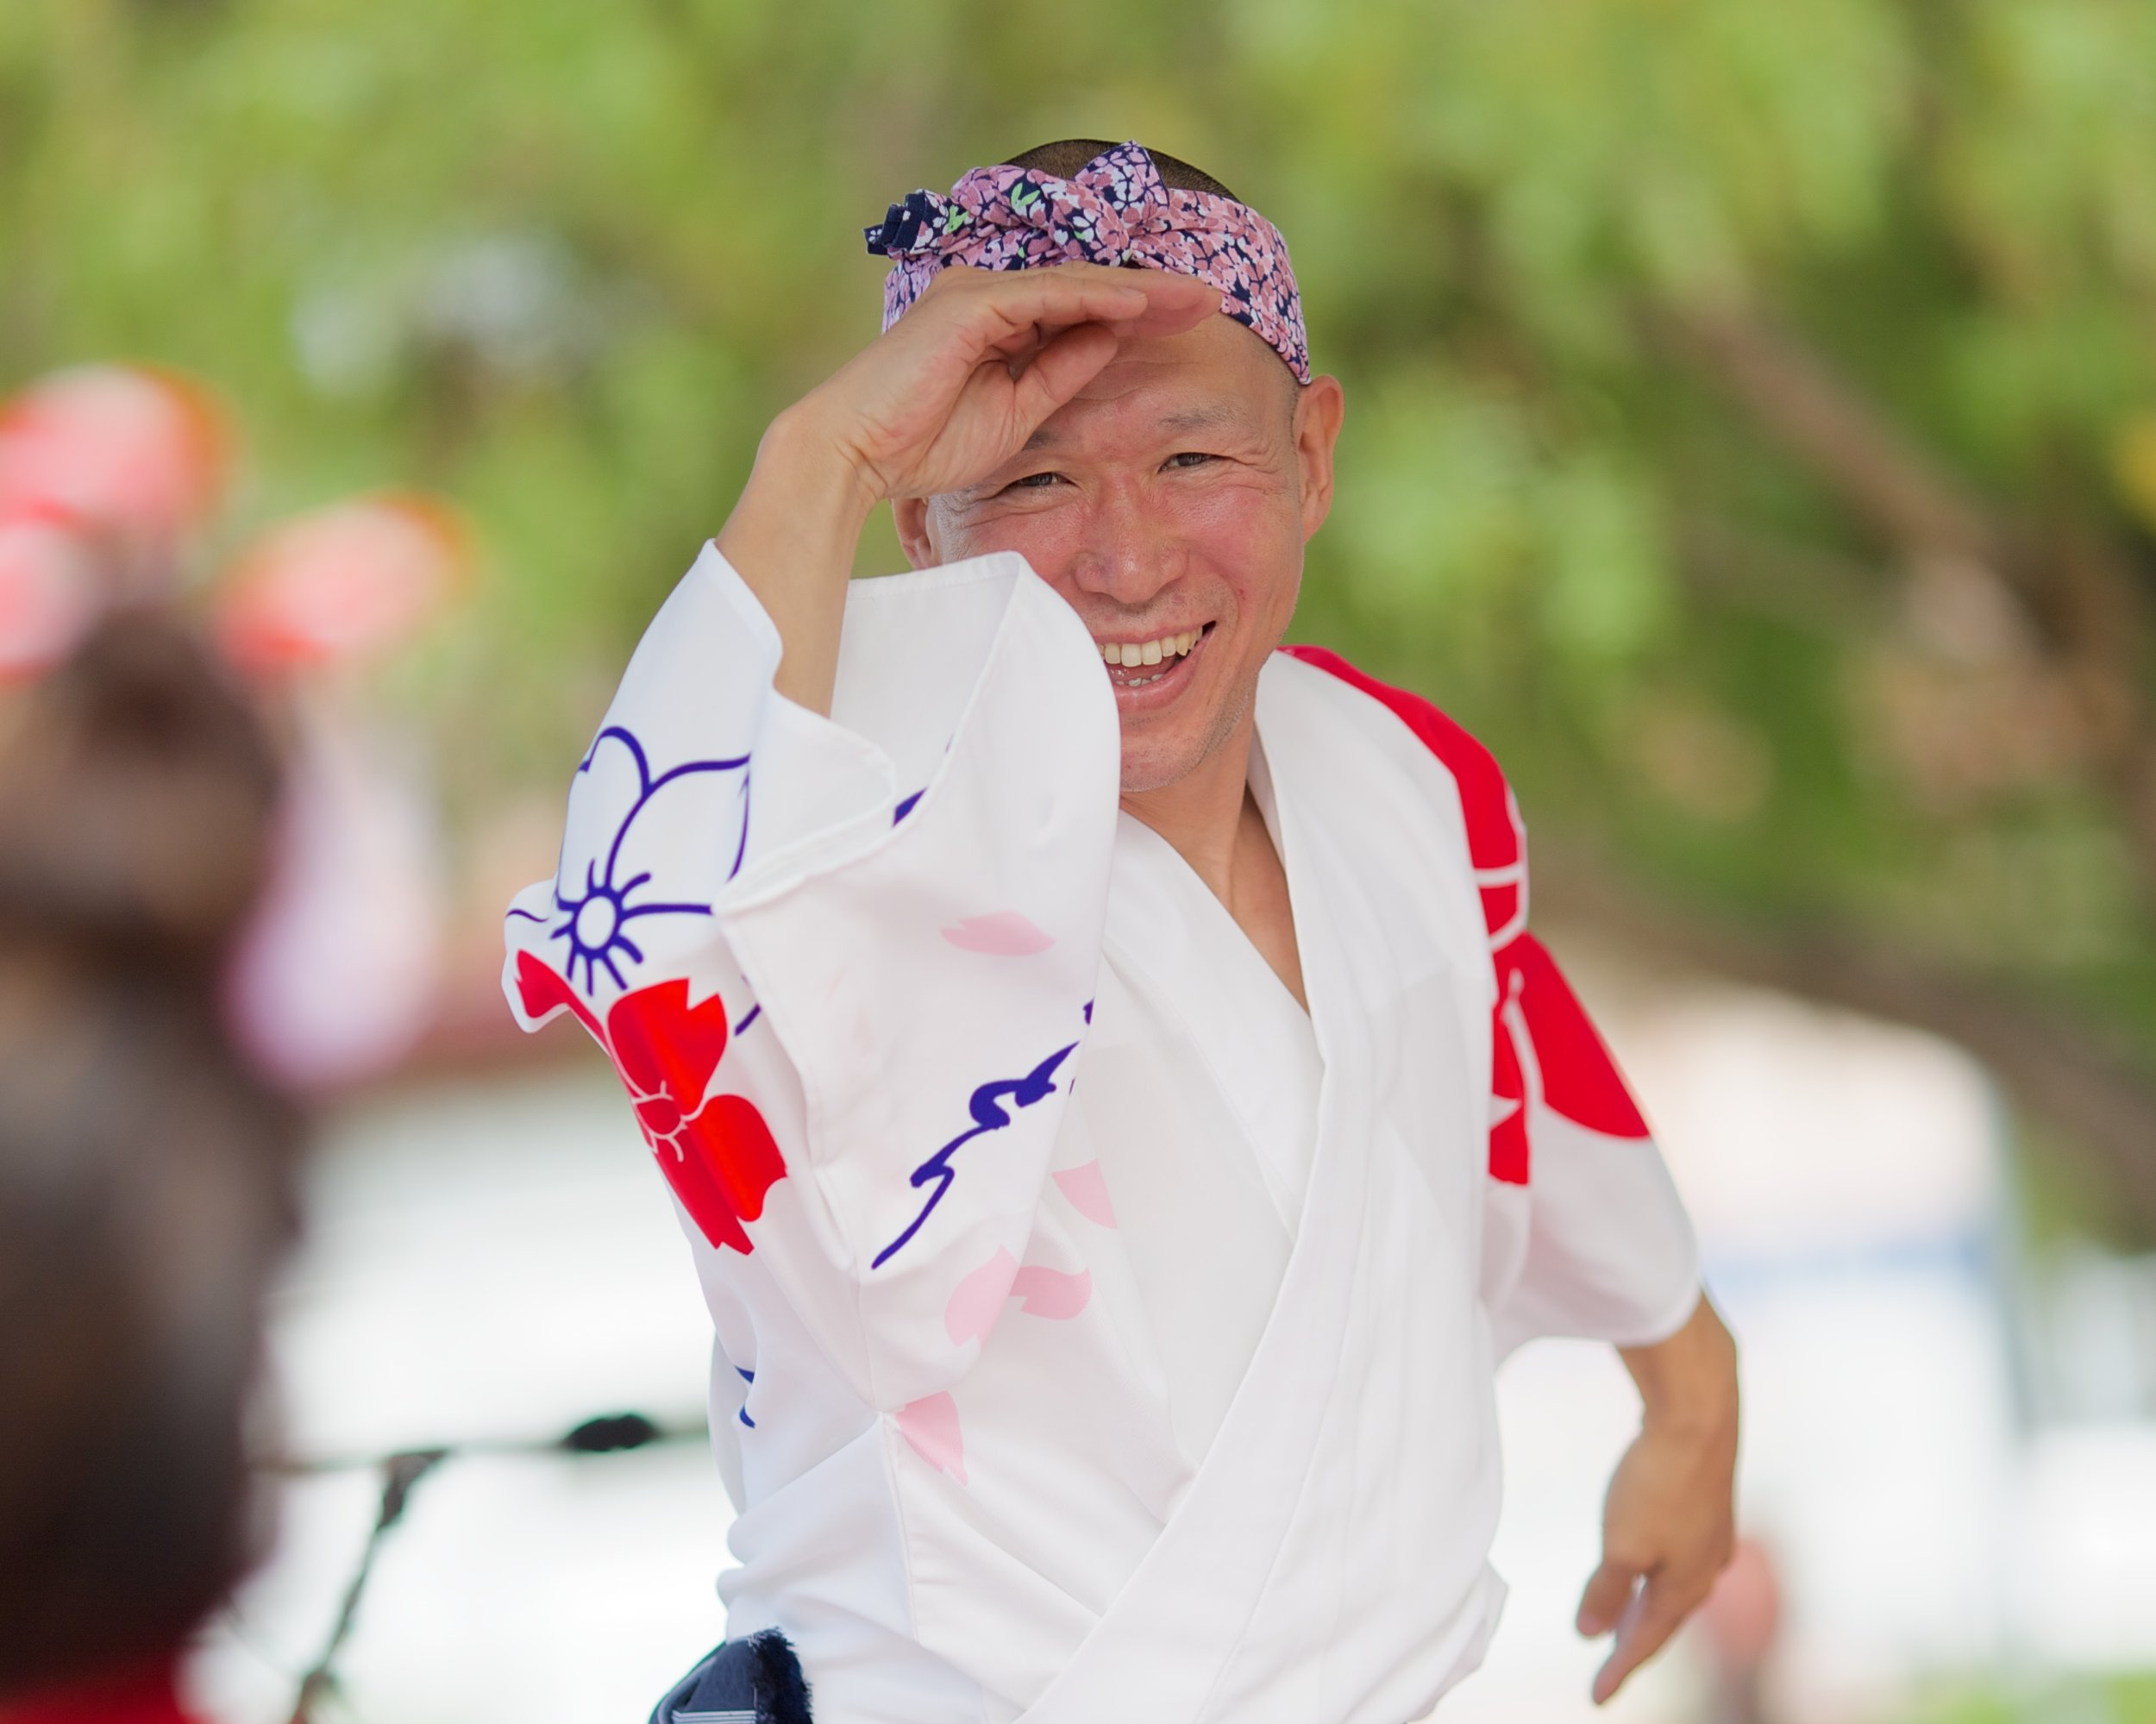 ko---sakura-ren---japanese-cultural-fair-of-santa-cruz-2015_19601057611_o.jpg